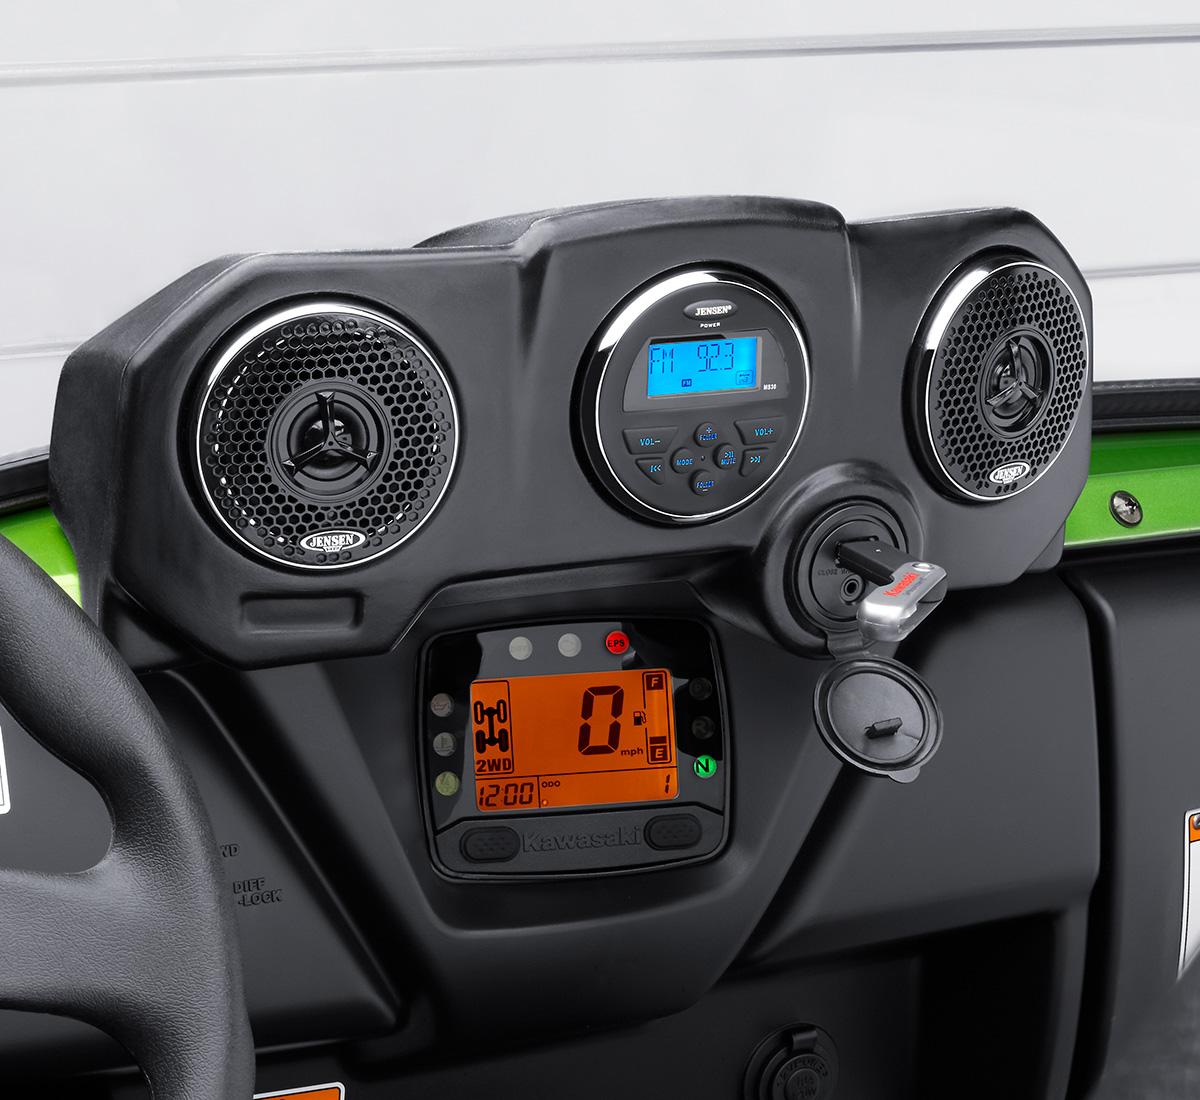 2014 Kawasaki Teryx Wiring Diagram 2013 2017 Teryx4 Le Side X By